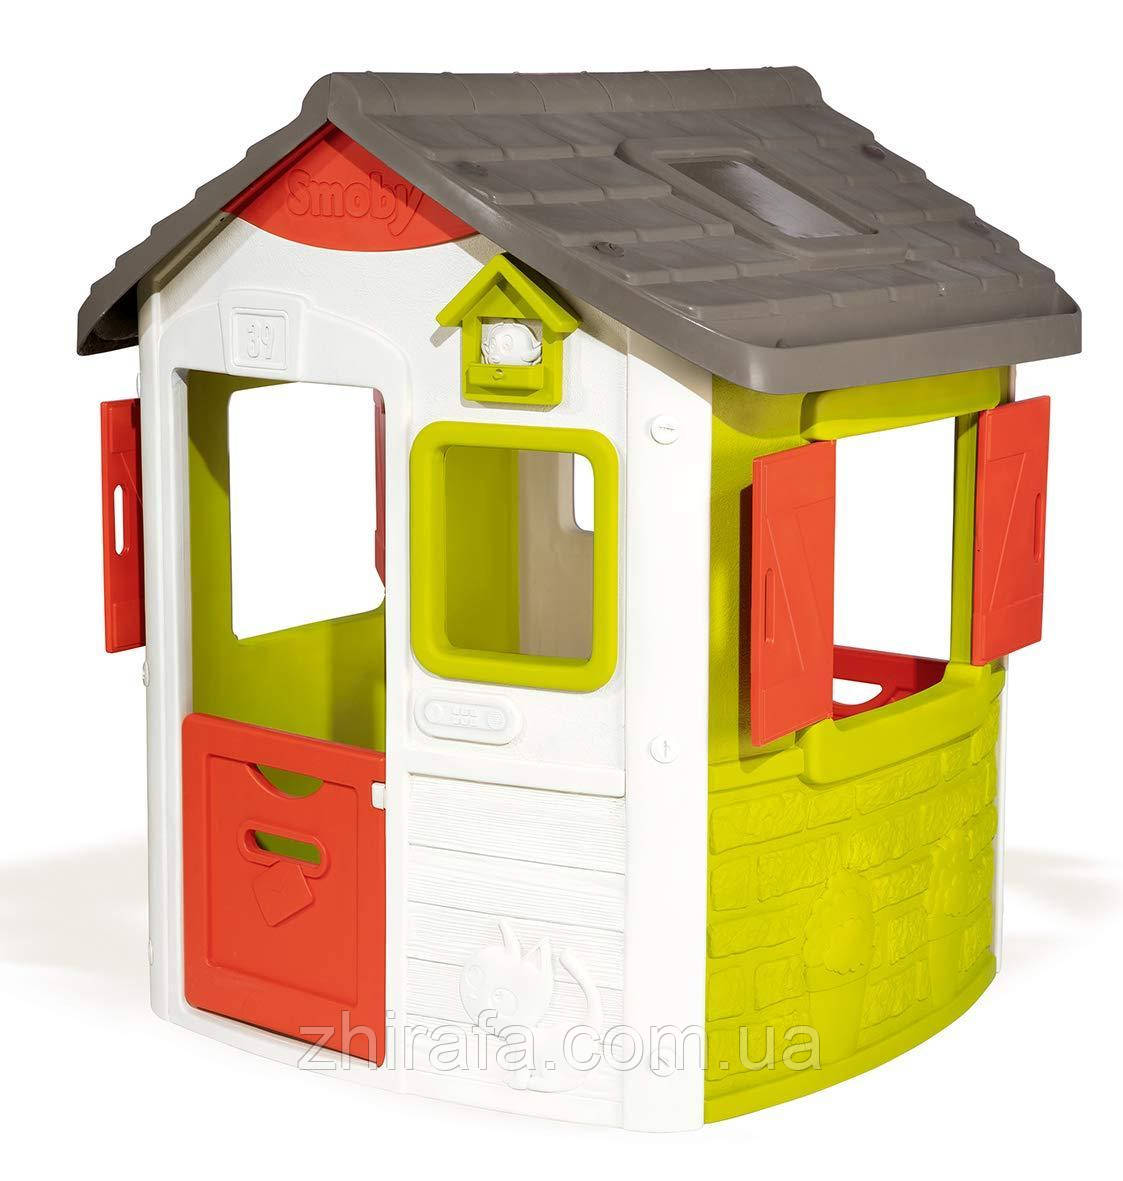 Smoby Игровой Домик лесника со ставнями Neo Jura Lodge 810500